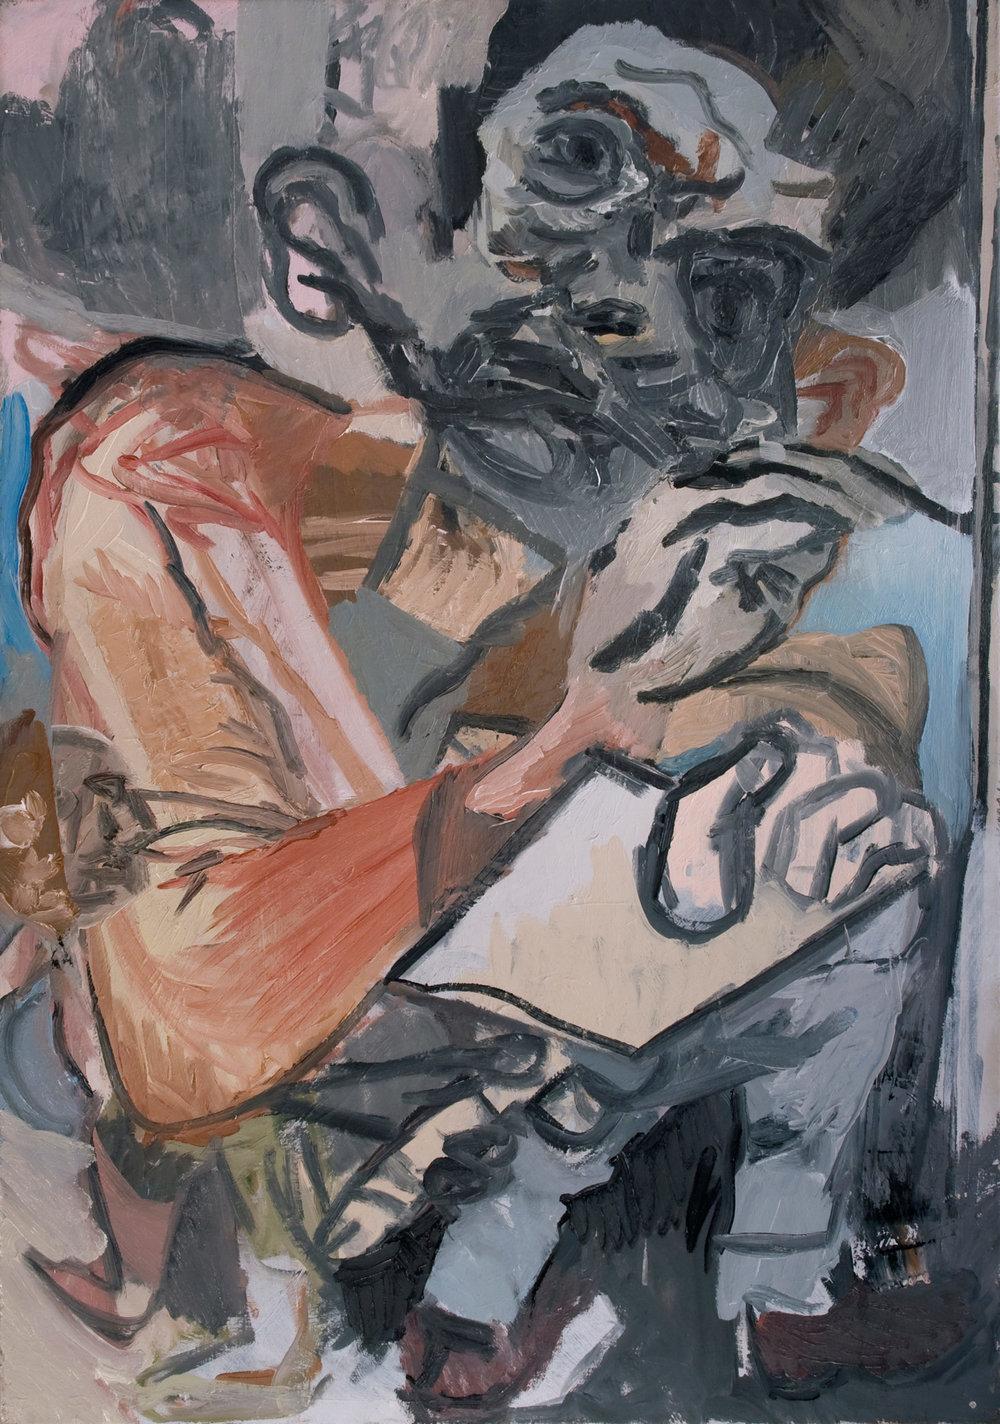 """The Idiot"" 2014   Oil on canvas. 70 x 100 cm"